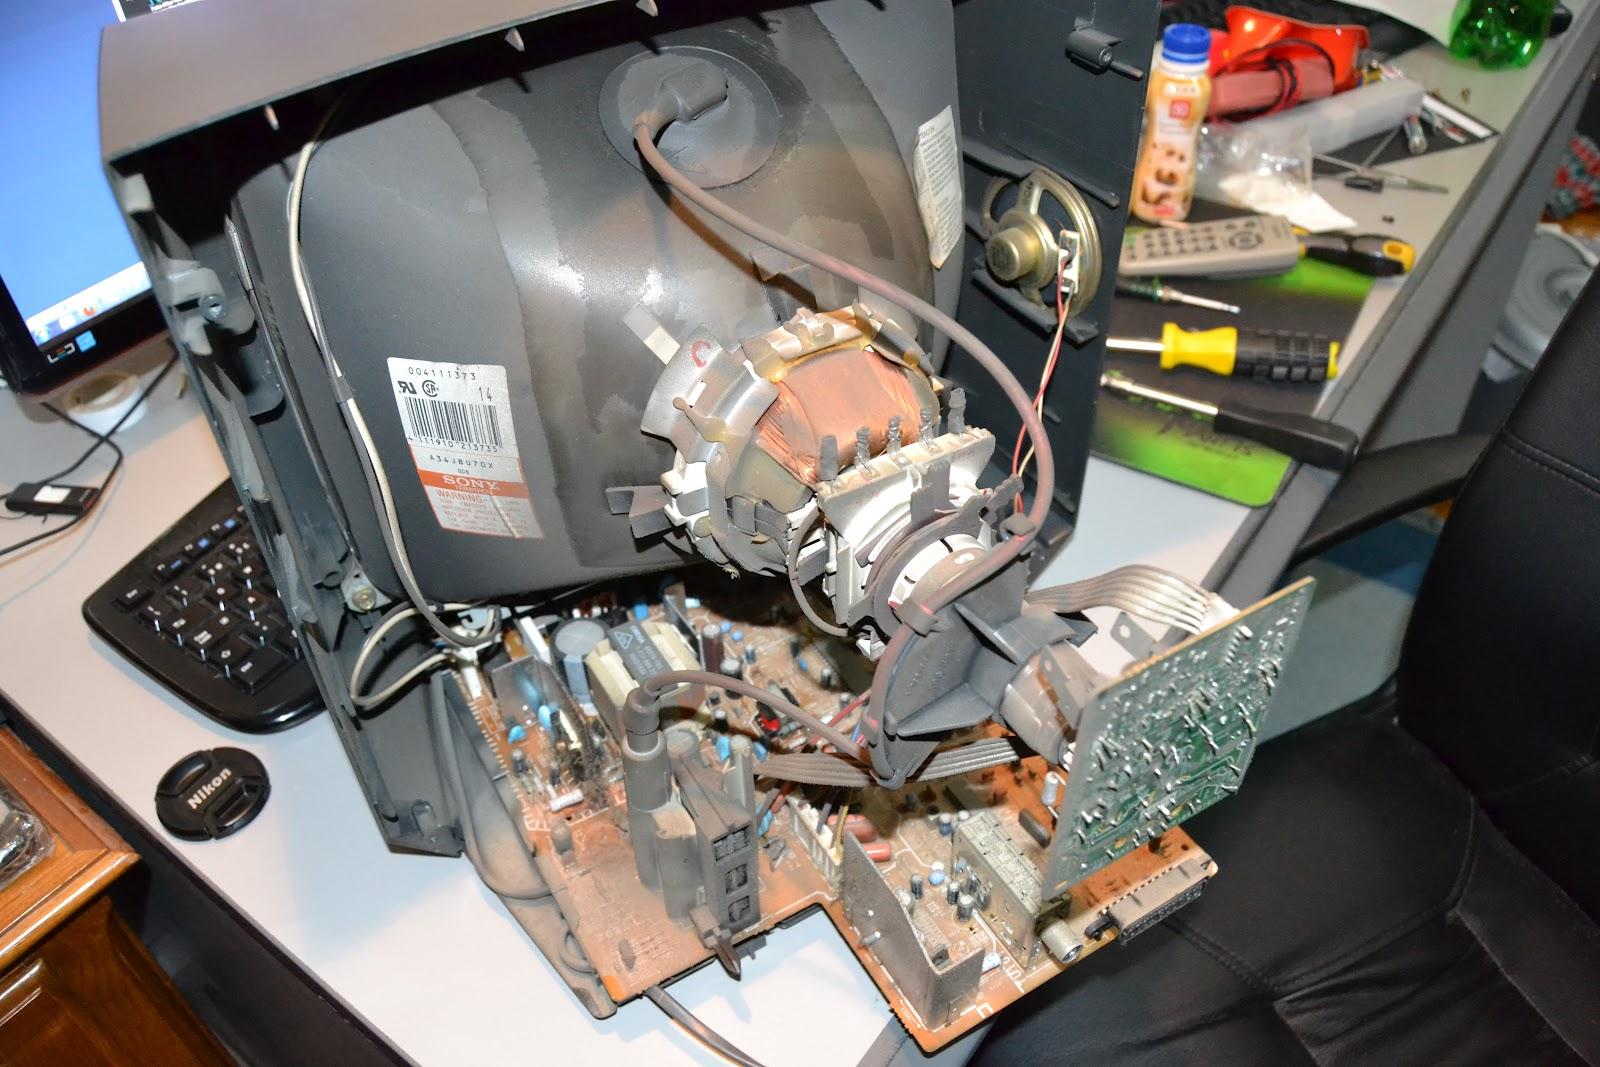 Crt Tv Repair Problems Nail Lamp Uv Vs Led